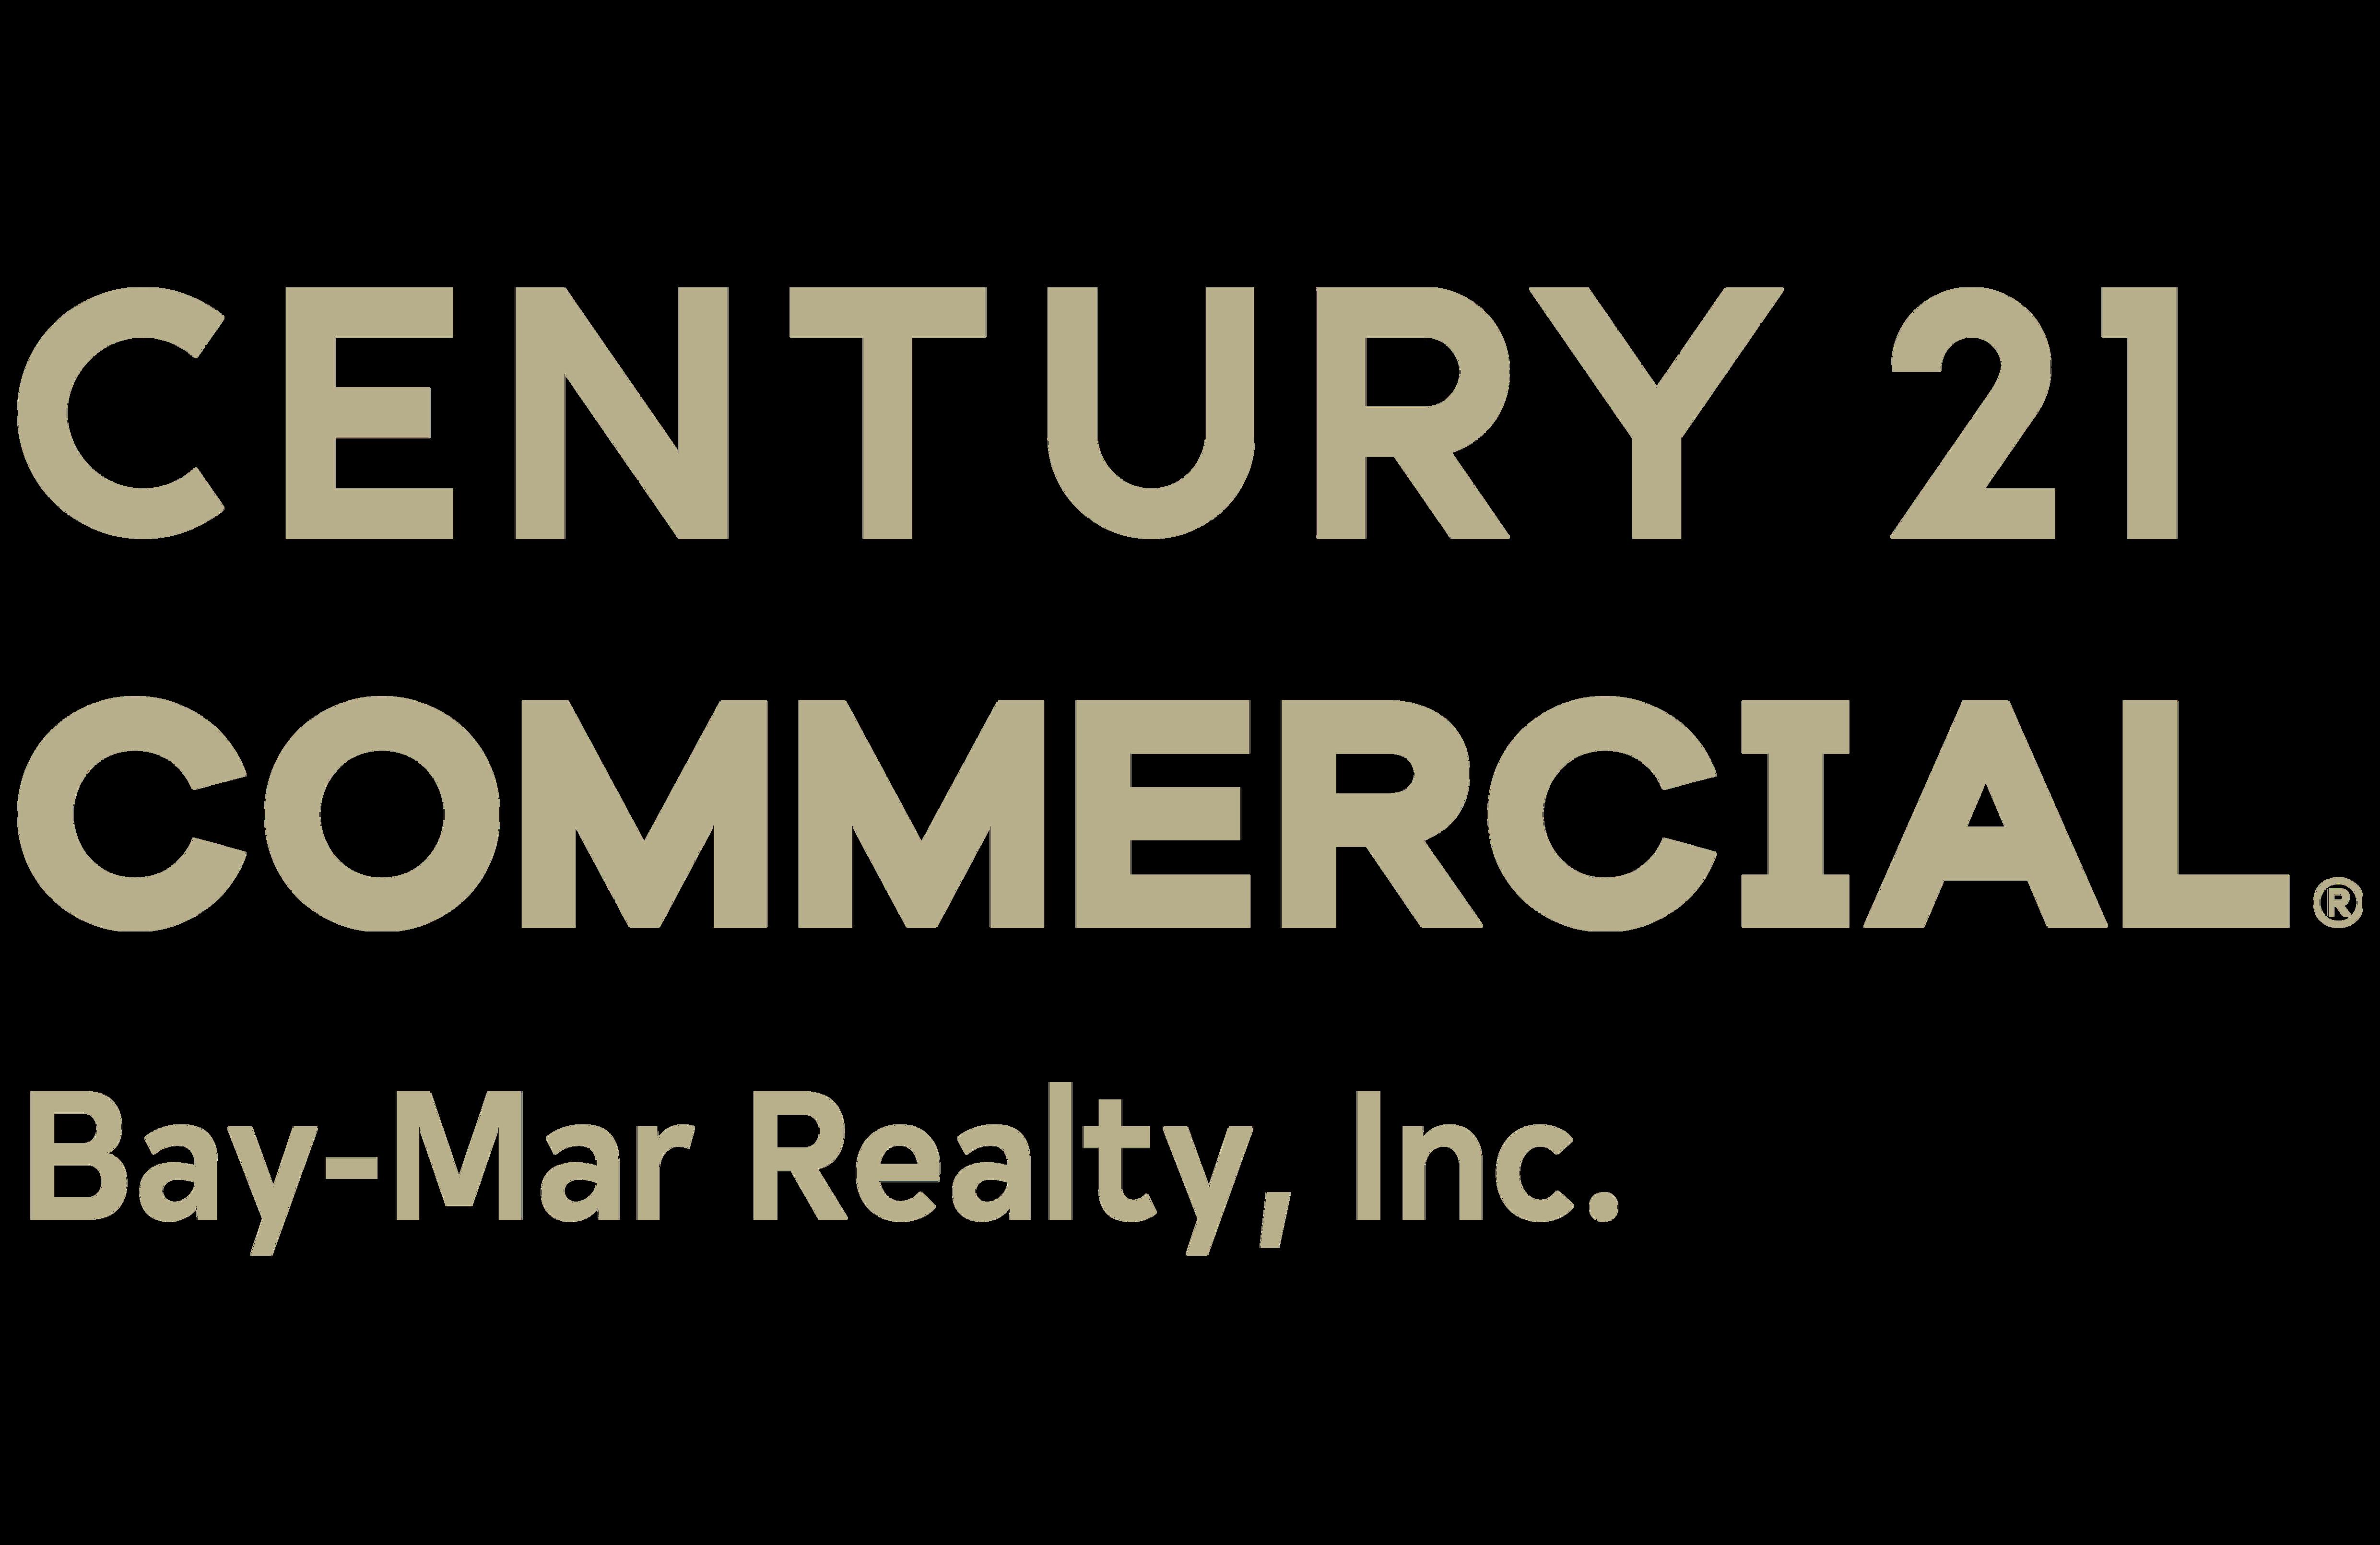 CENTURY 21 Bay-Mar Realty, Inc.